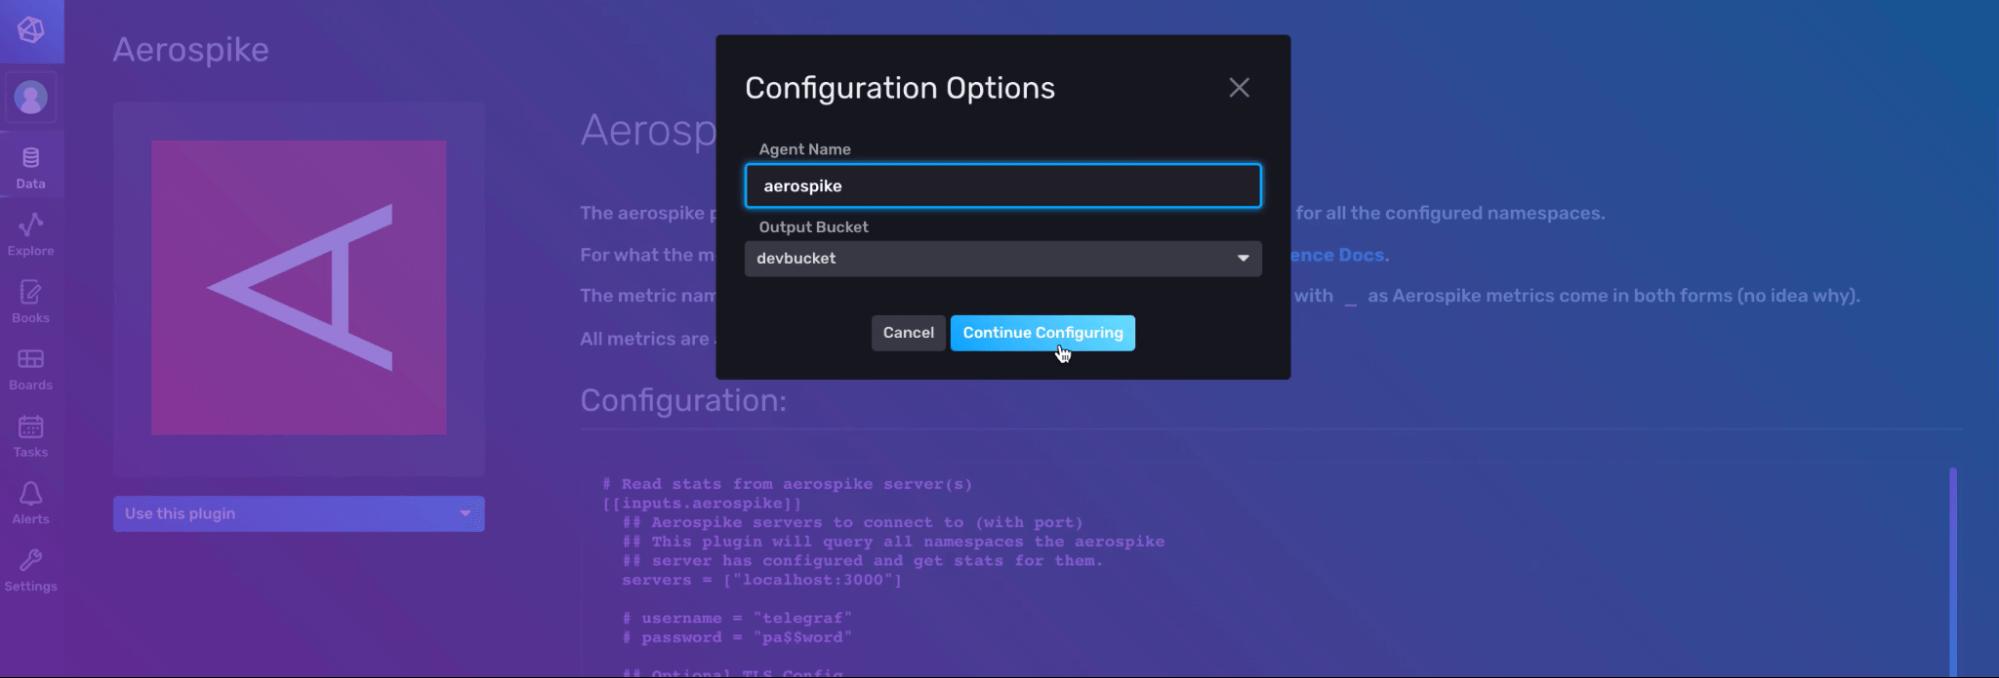 Configuration Options